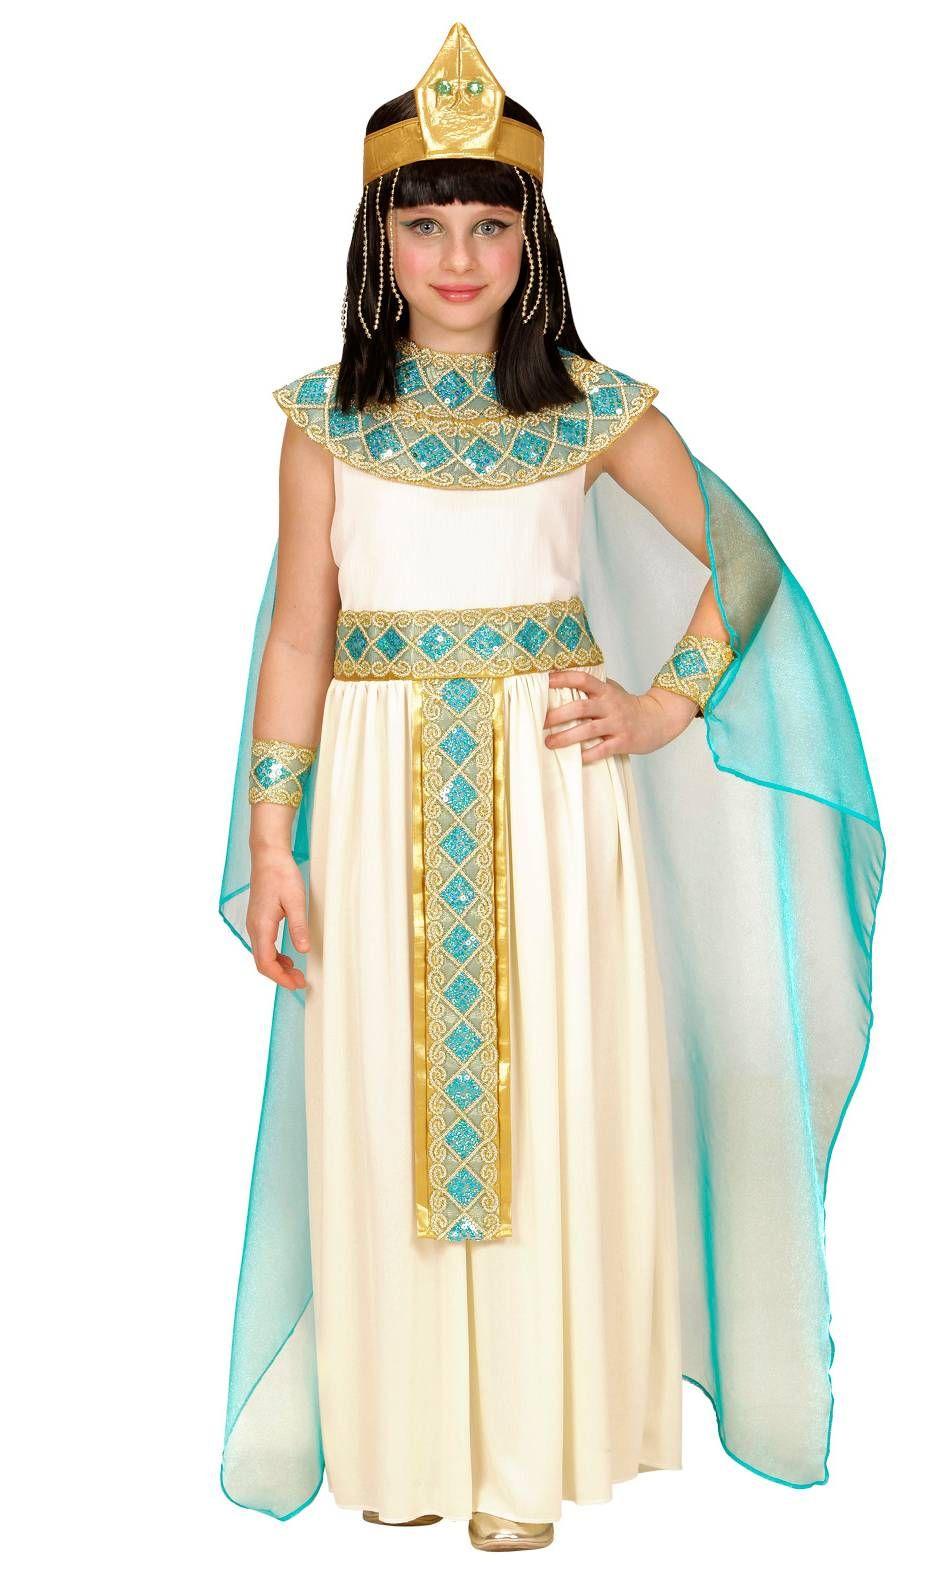 Costume Cléopâtre fille-v59380   déguisements   Costumes, Princess ... e3b2a3ddded7